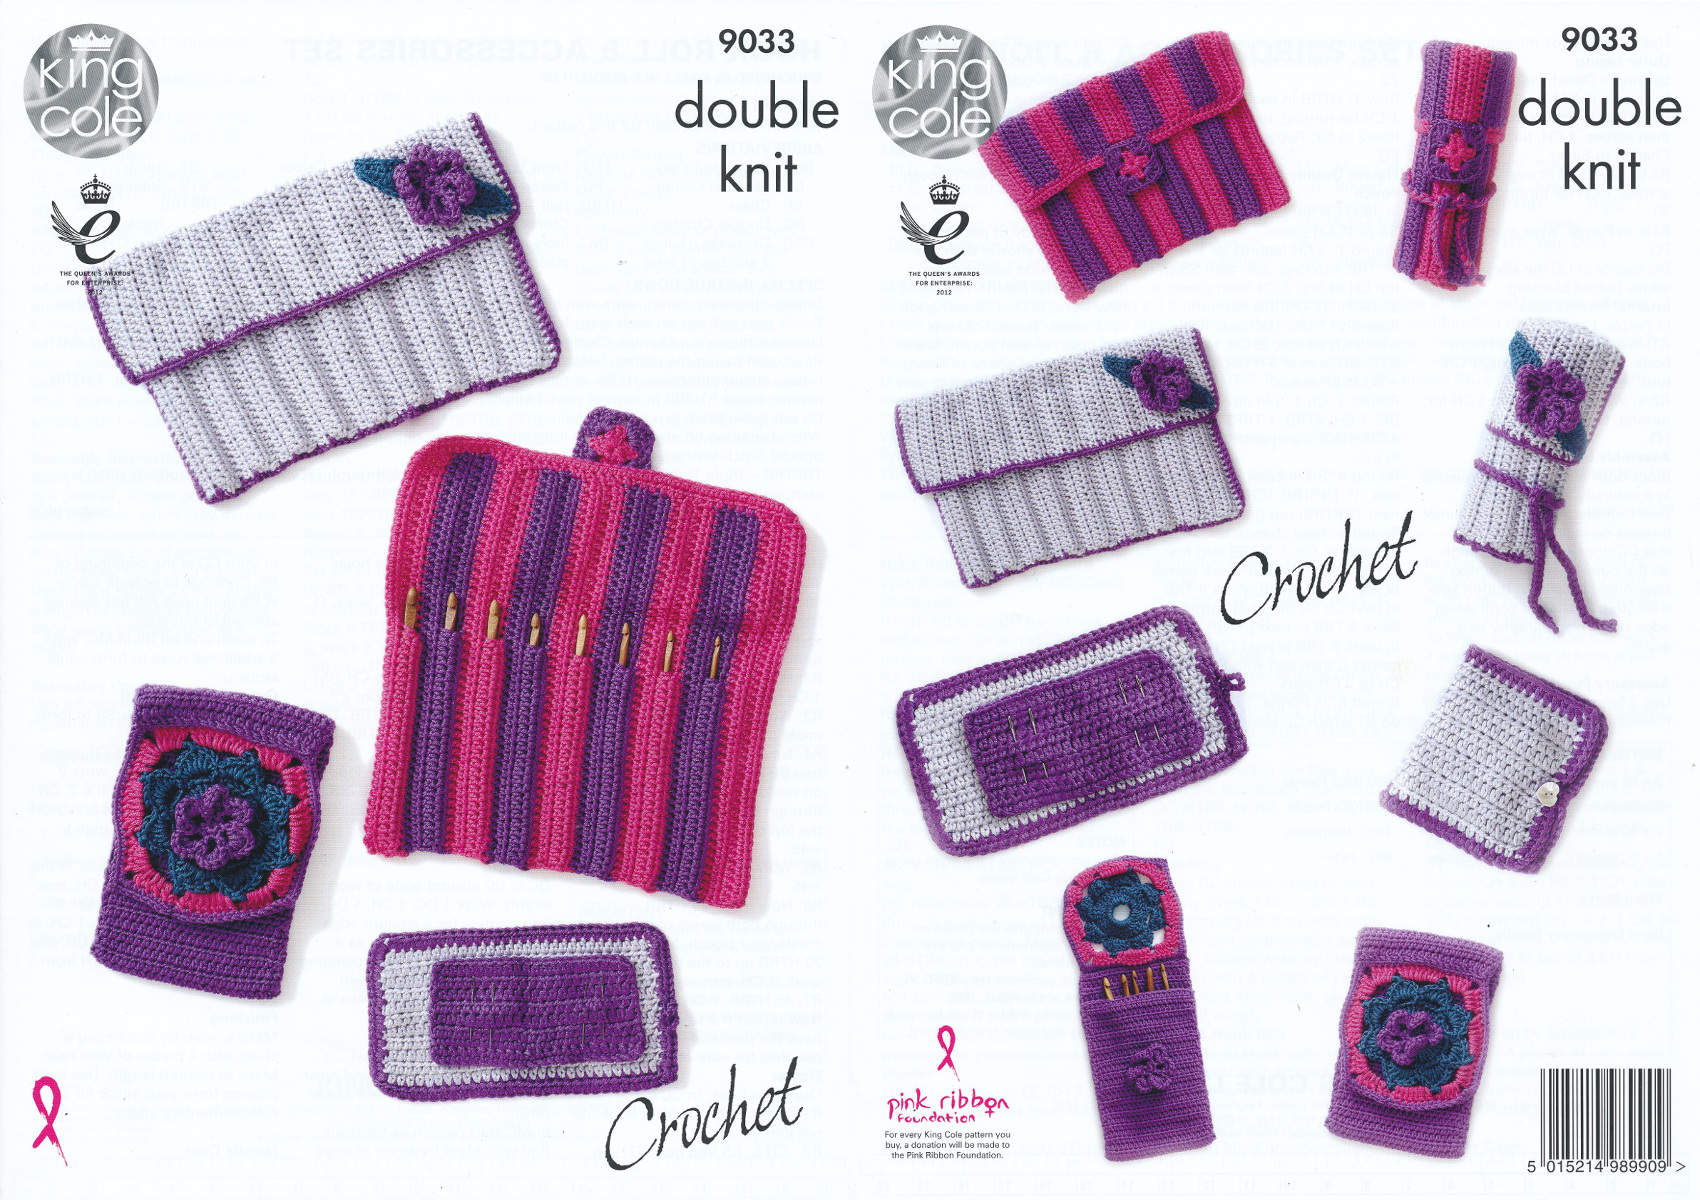 Knitting Accessories Patterns : King cole double knit crochet pattern hook roll needle